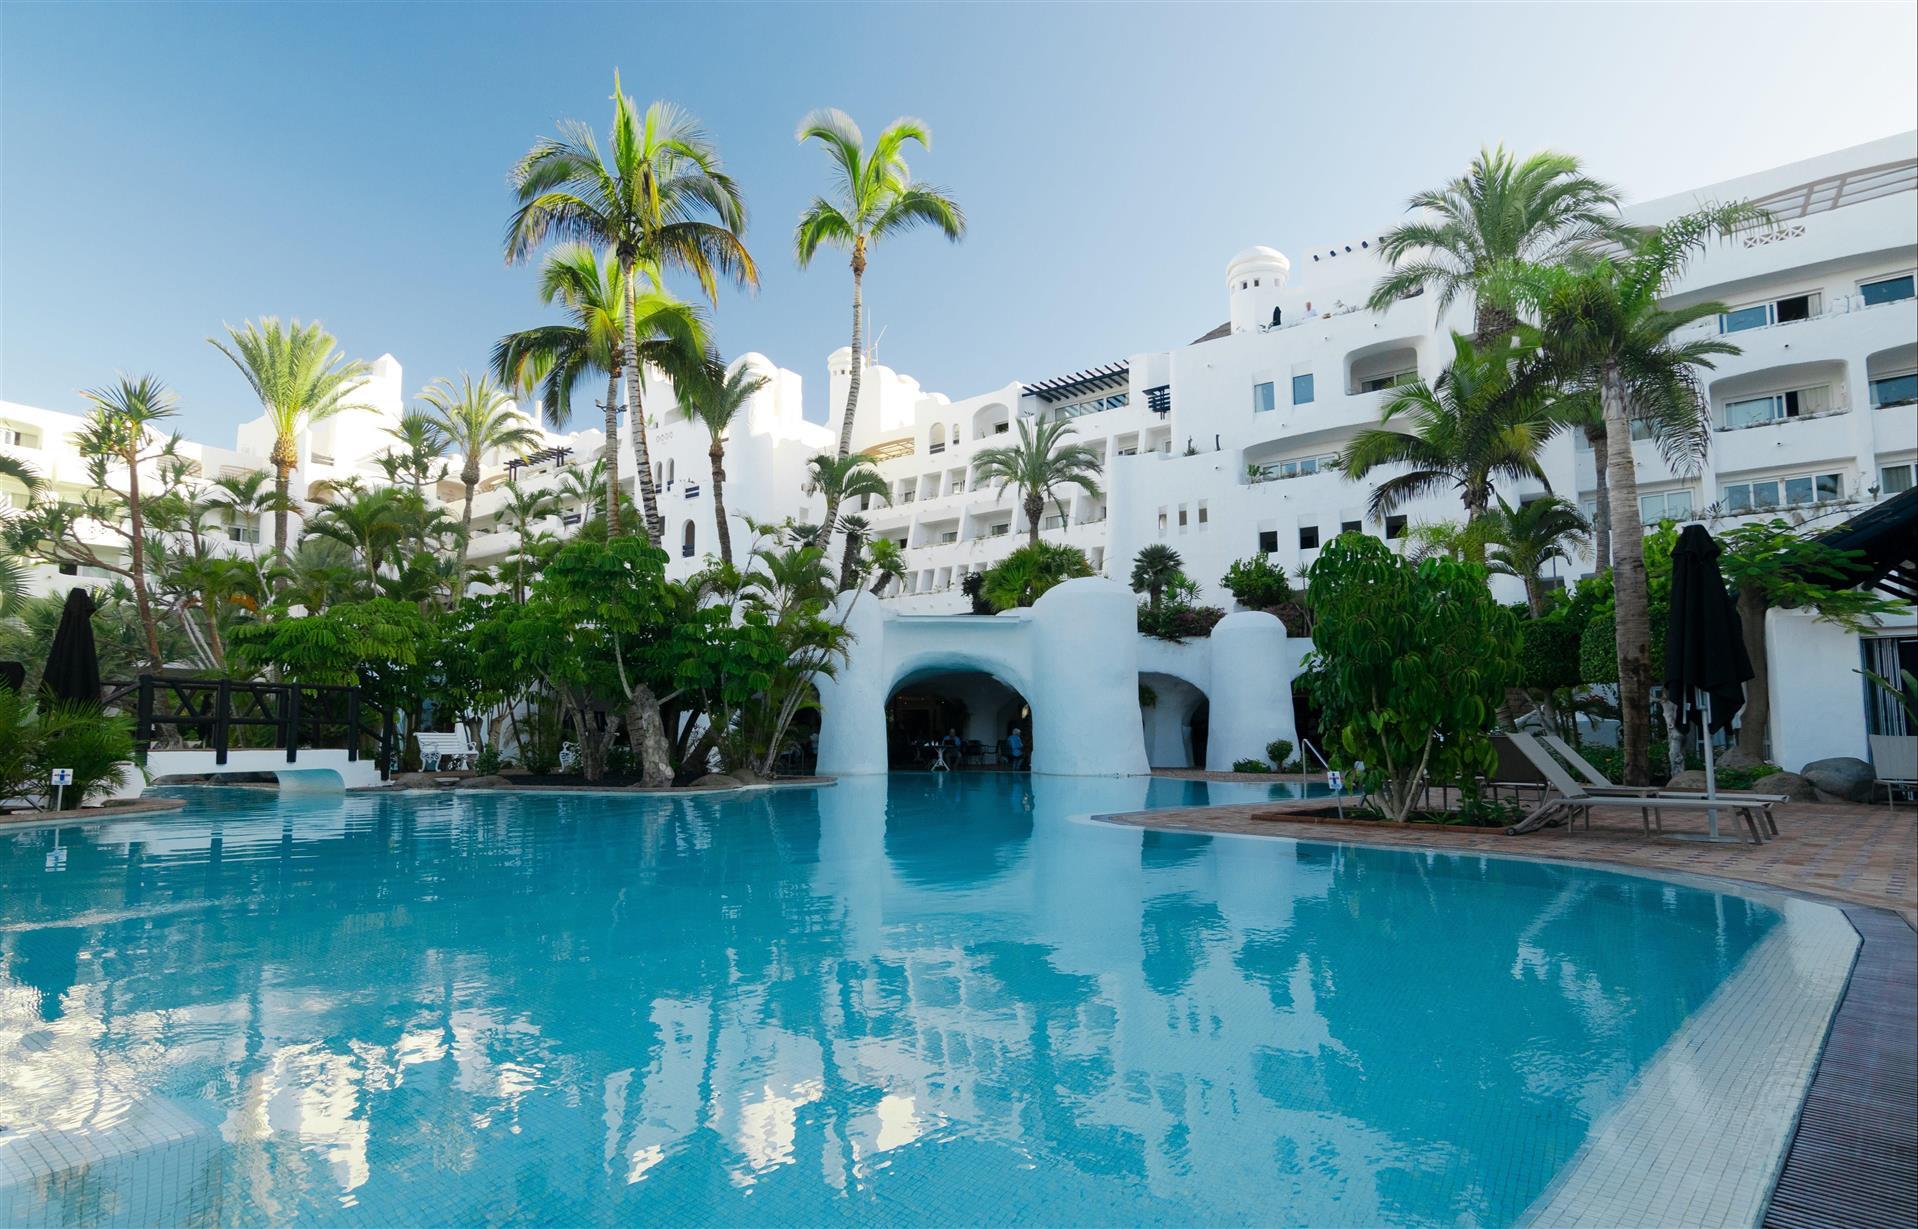 Meetings And Events At Hotel Jardin Tropical, Santa Cruz De ... avec Jardin Tropical Tenerife